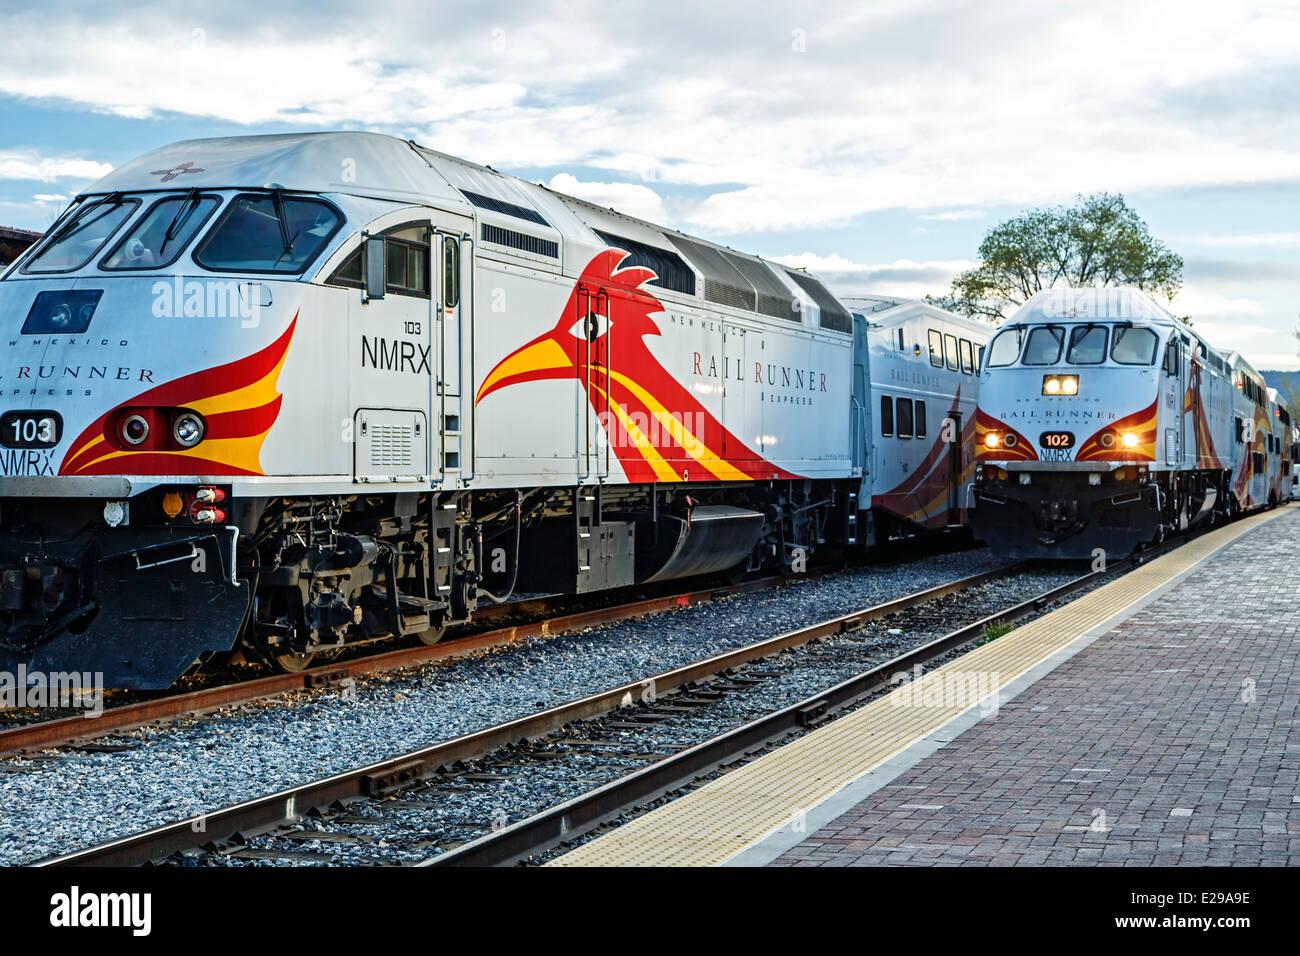 Railrunner Express commuter trains, Santa Fe Railyard, Santa Fe, New Mexico USA - Stock Image